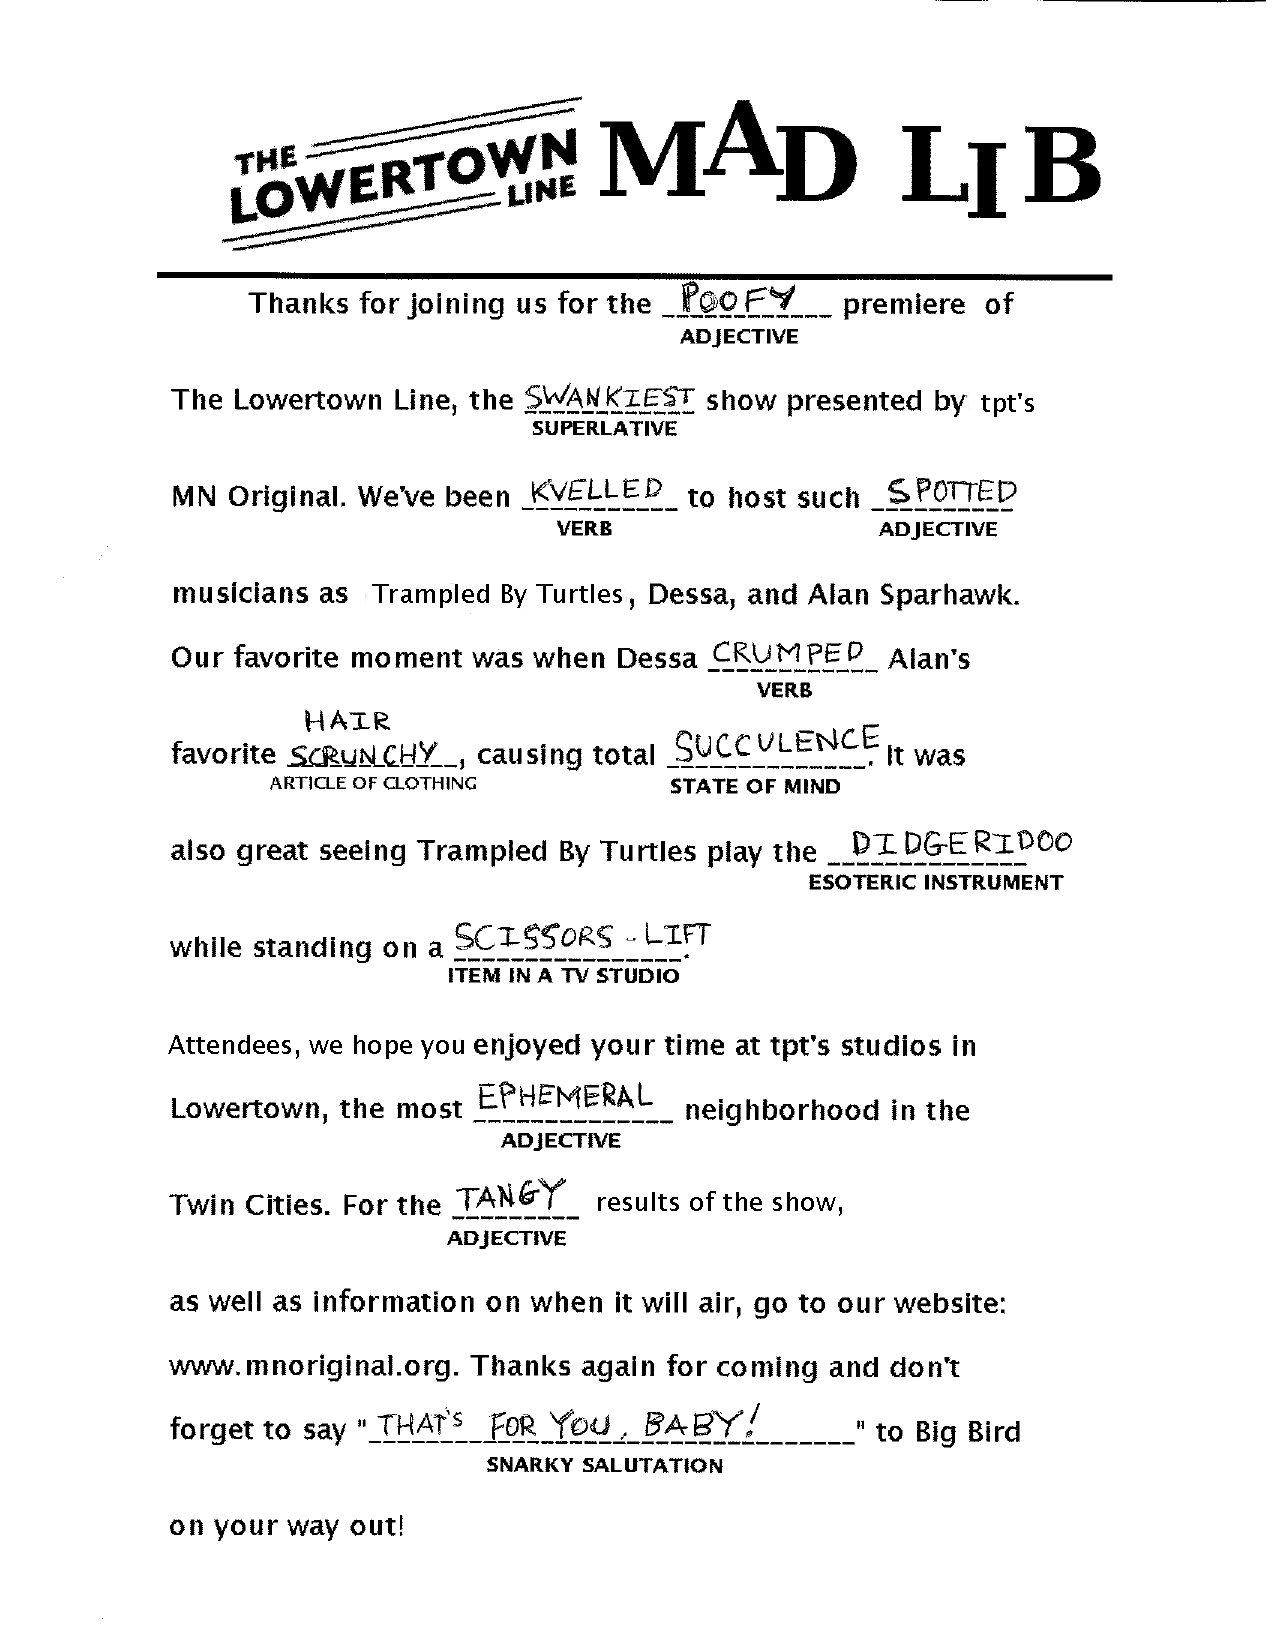 The Lowertown Line Mad Lib